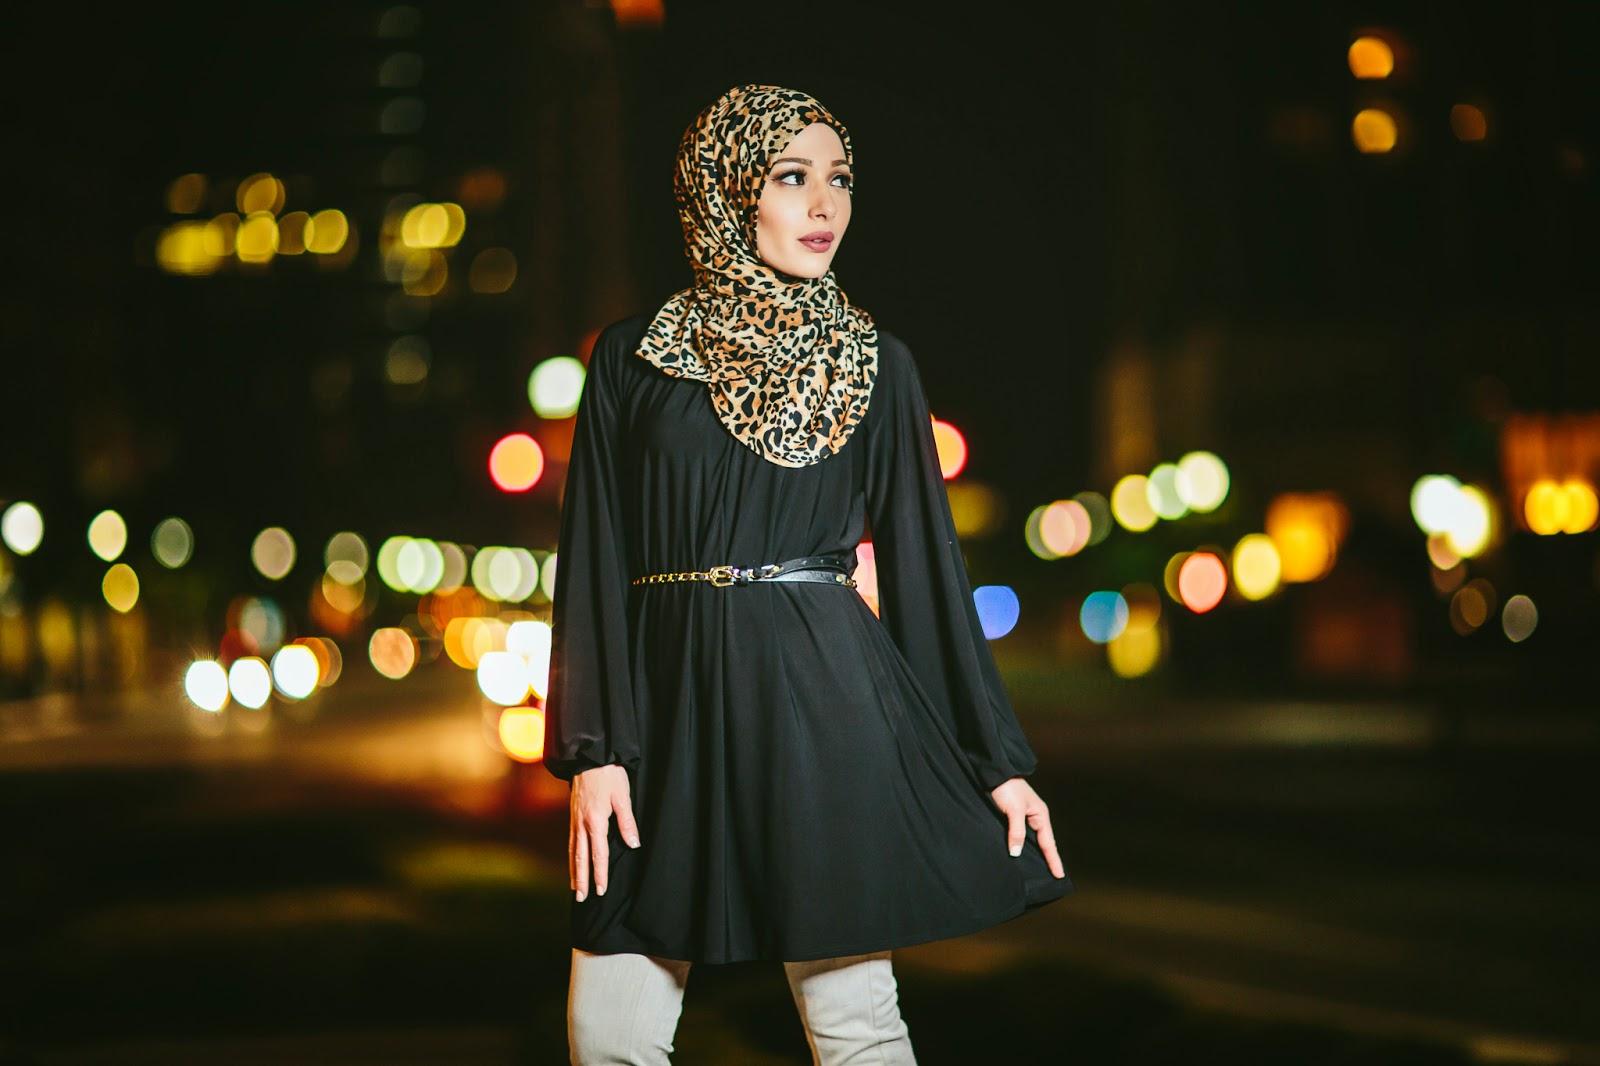 hijab moderne idee tenue hijab hiver hijab et voile mode style mariage et fashion dans l 39 islam. Black Bedroom Furniture Sets. Home Design Ideas